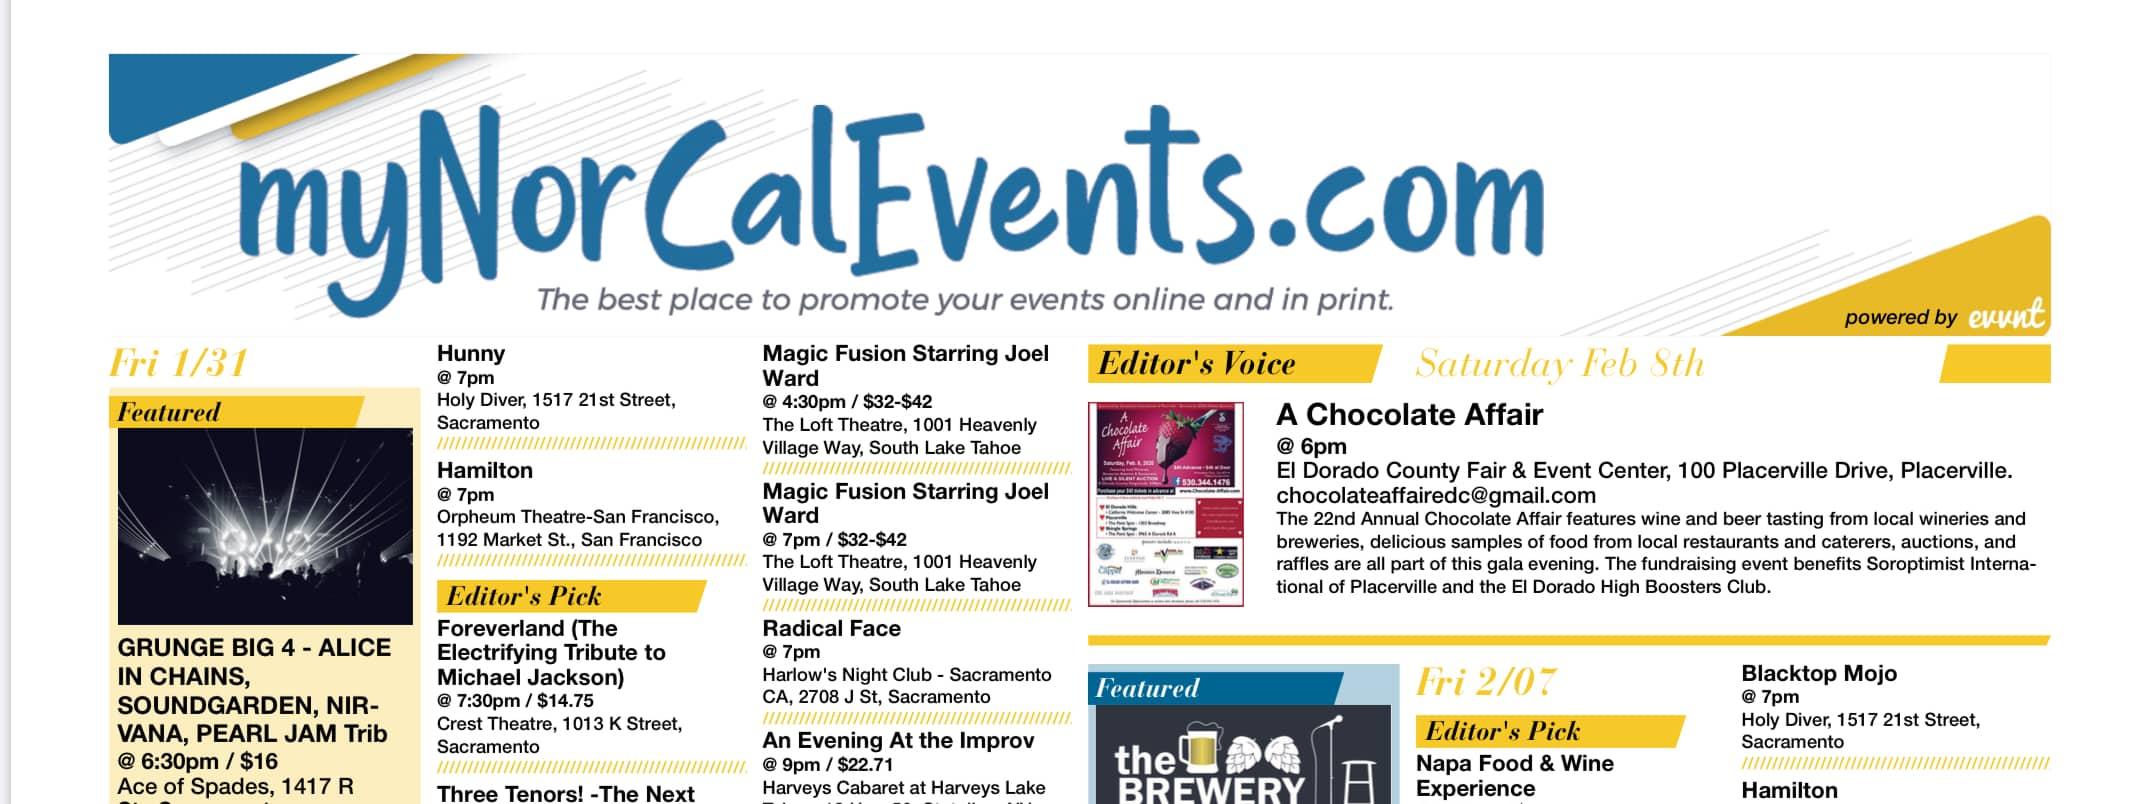 myNorCalEvents.com screenshot